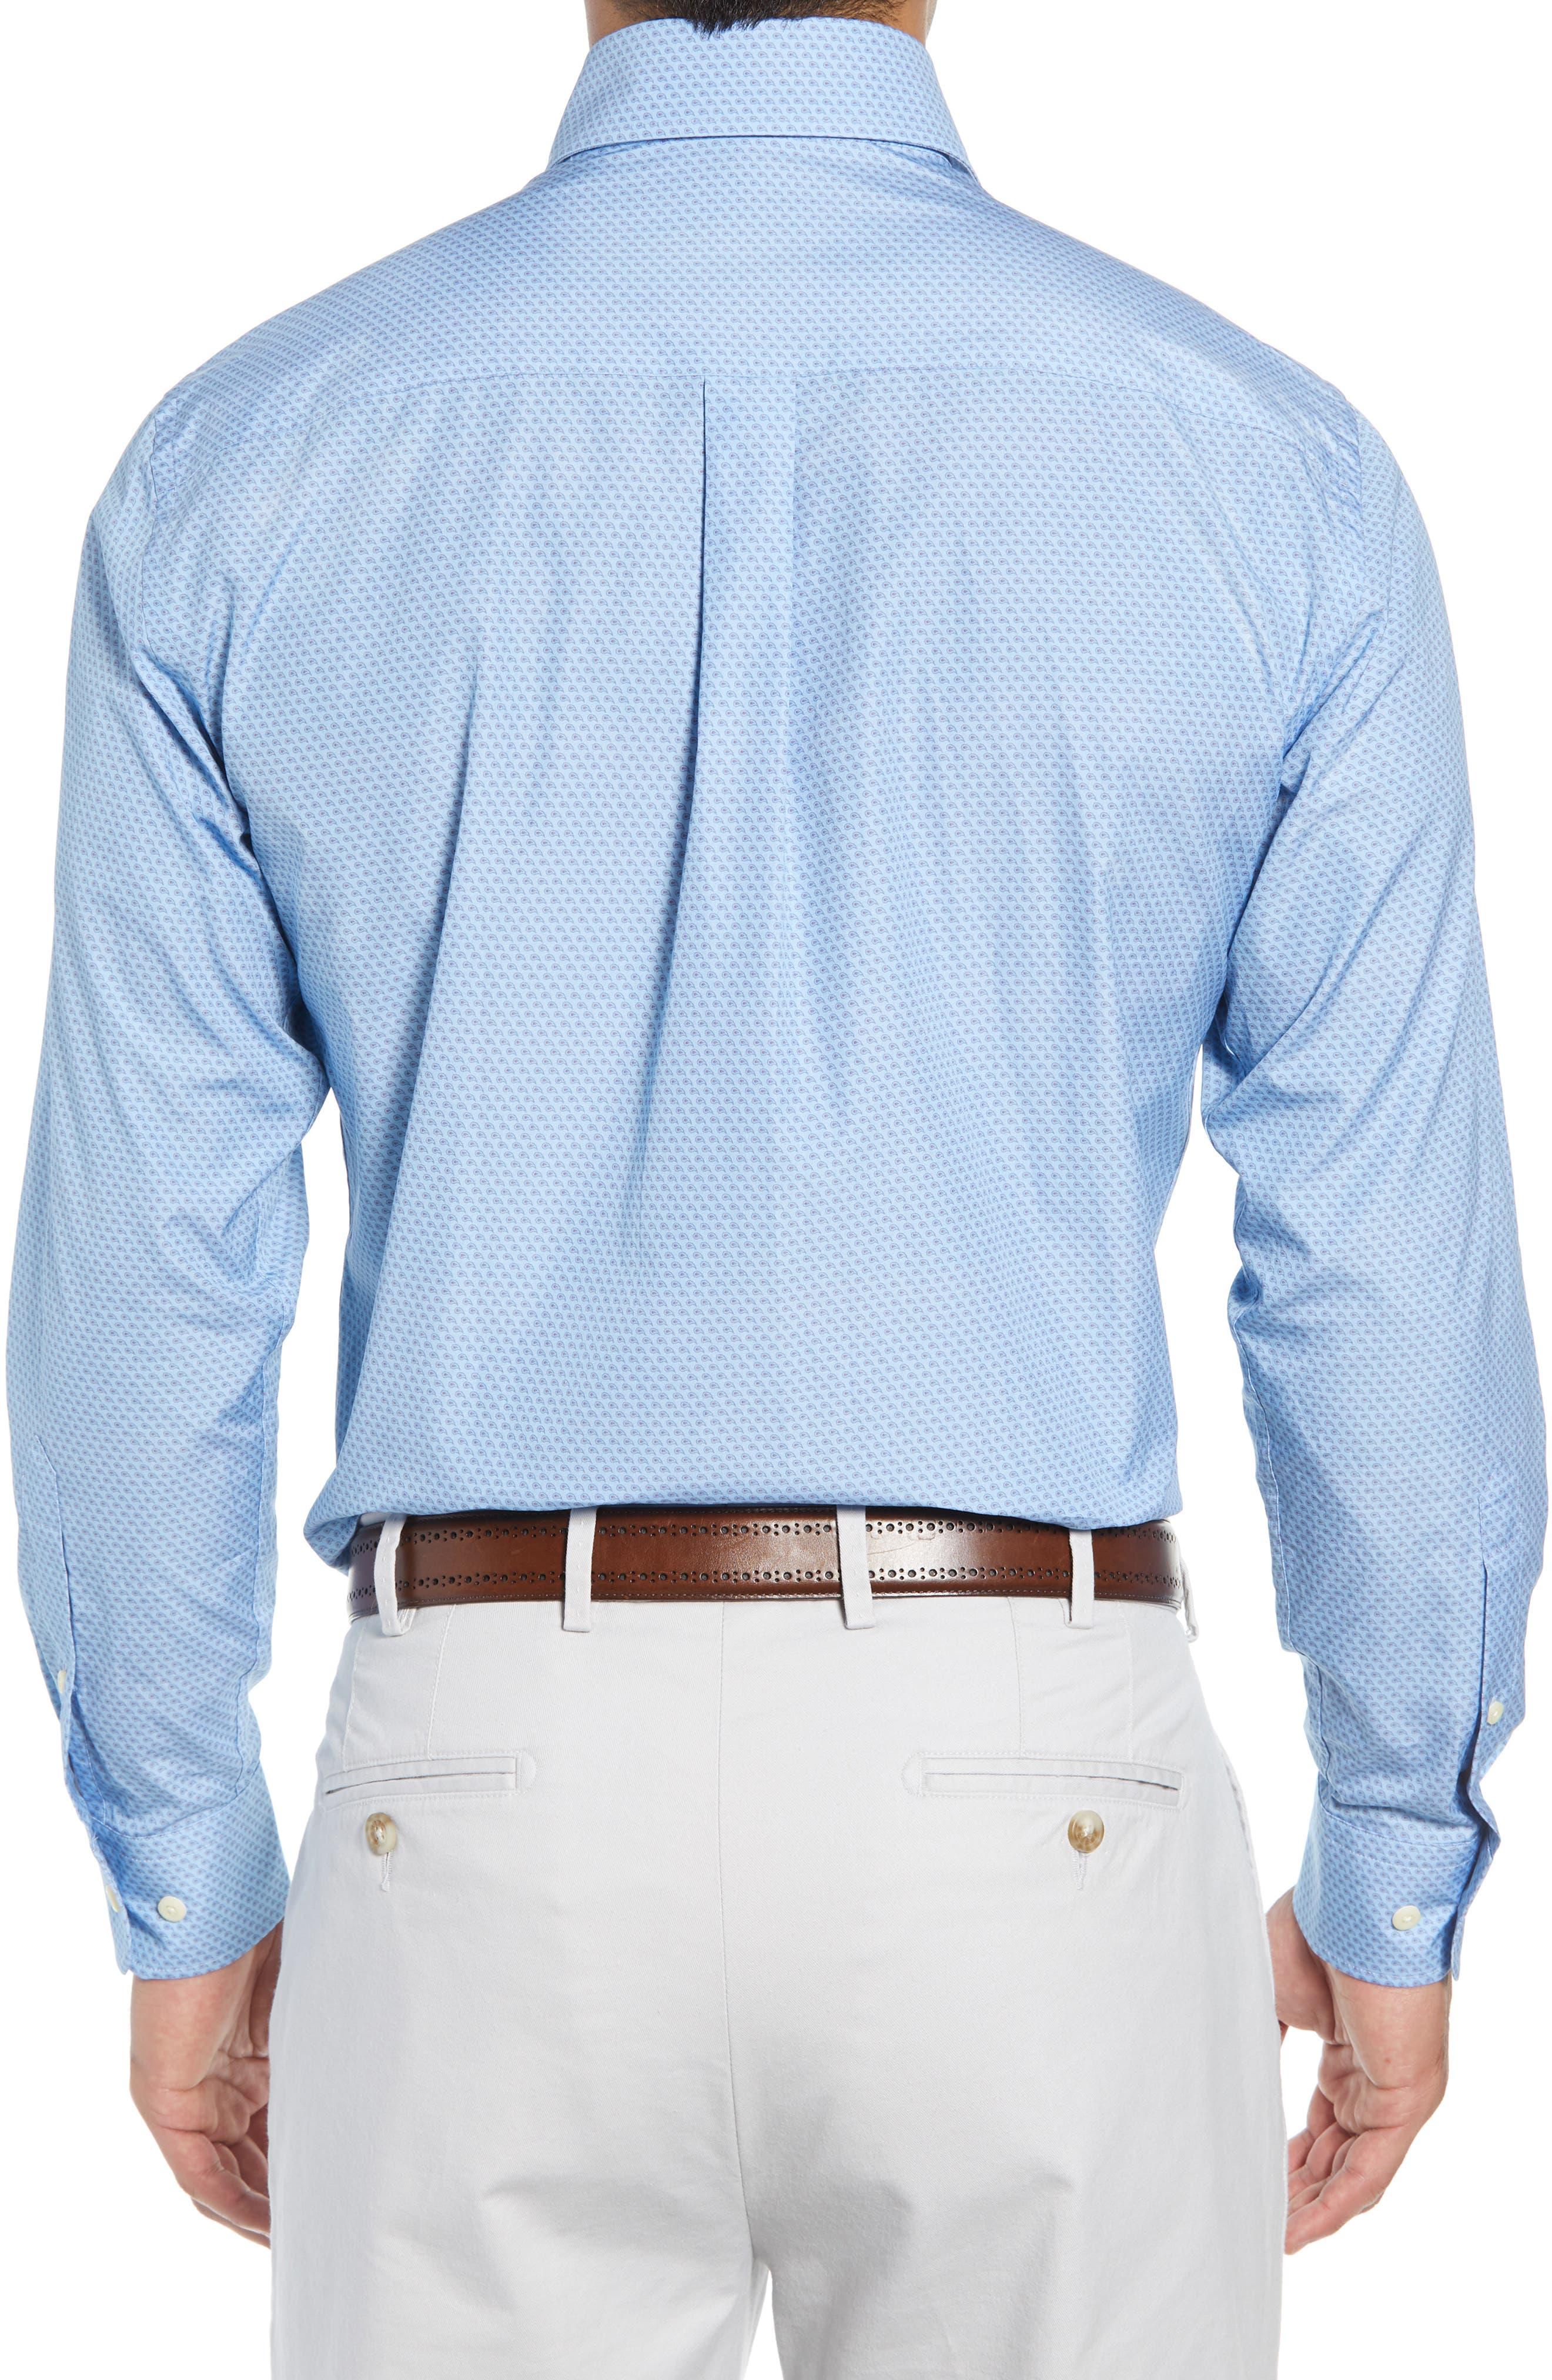 Niblick Regular Fit Sport Shirt,                             Alternate thumbnail 3, color,                             BLUE